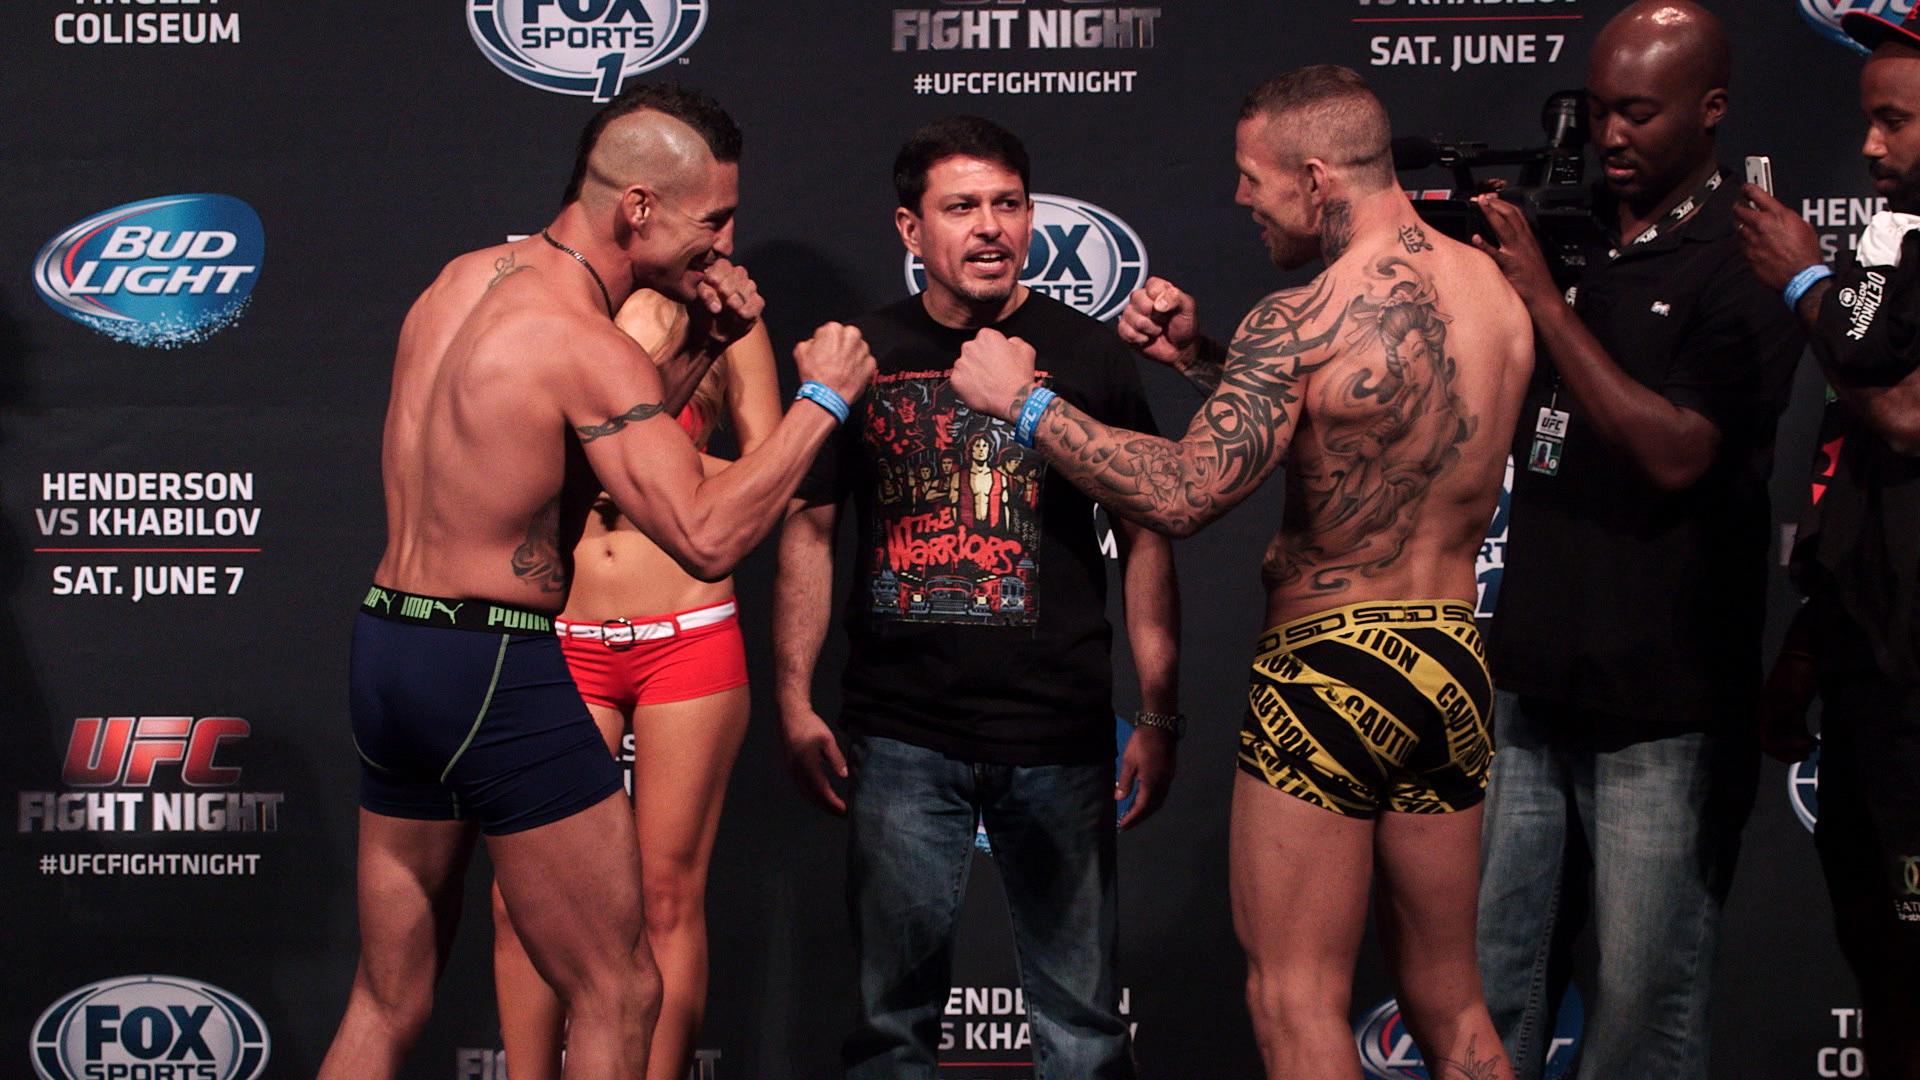 UFC Fight Night 42 weigh-in ph...